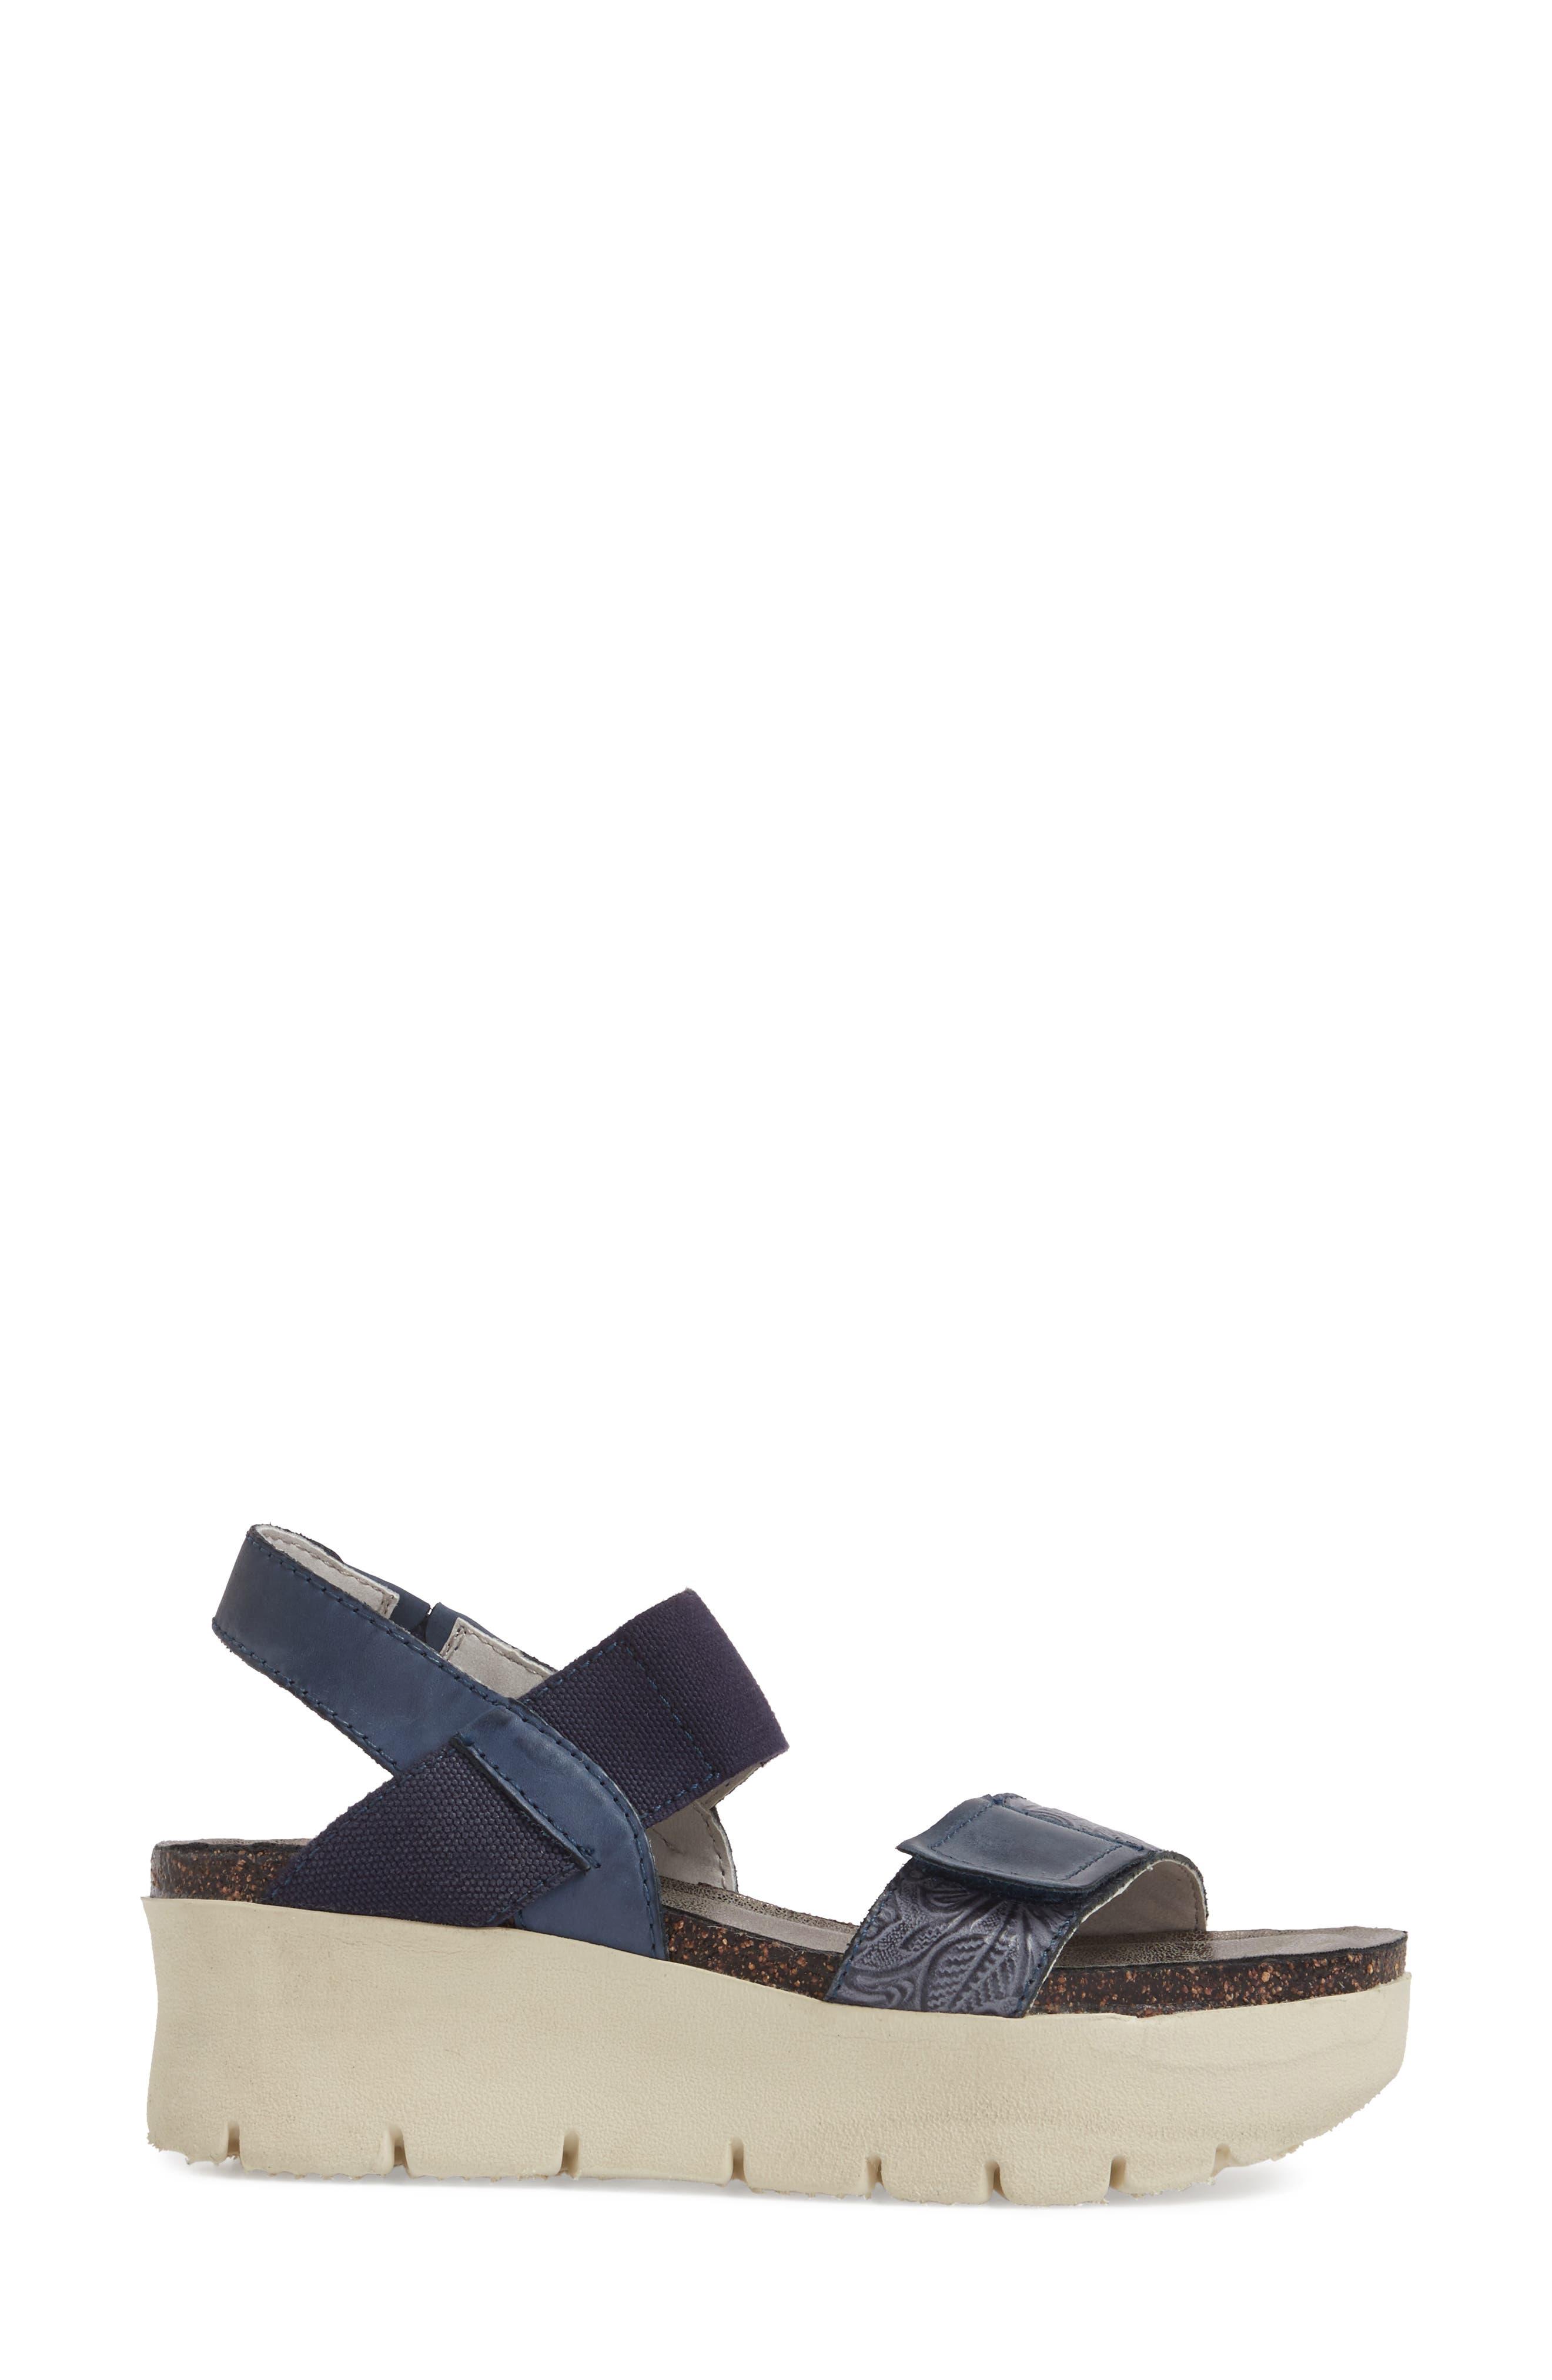 Nova Platform Sandal,                             Alternate thumbnail 3, color,                             Navy Leather